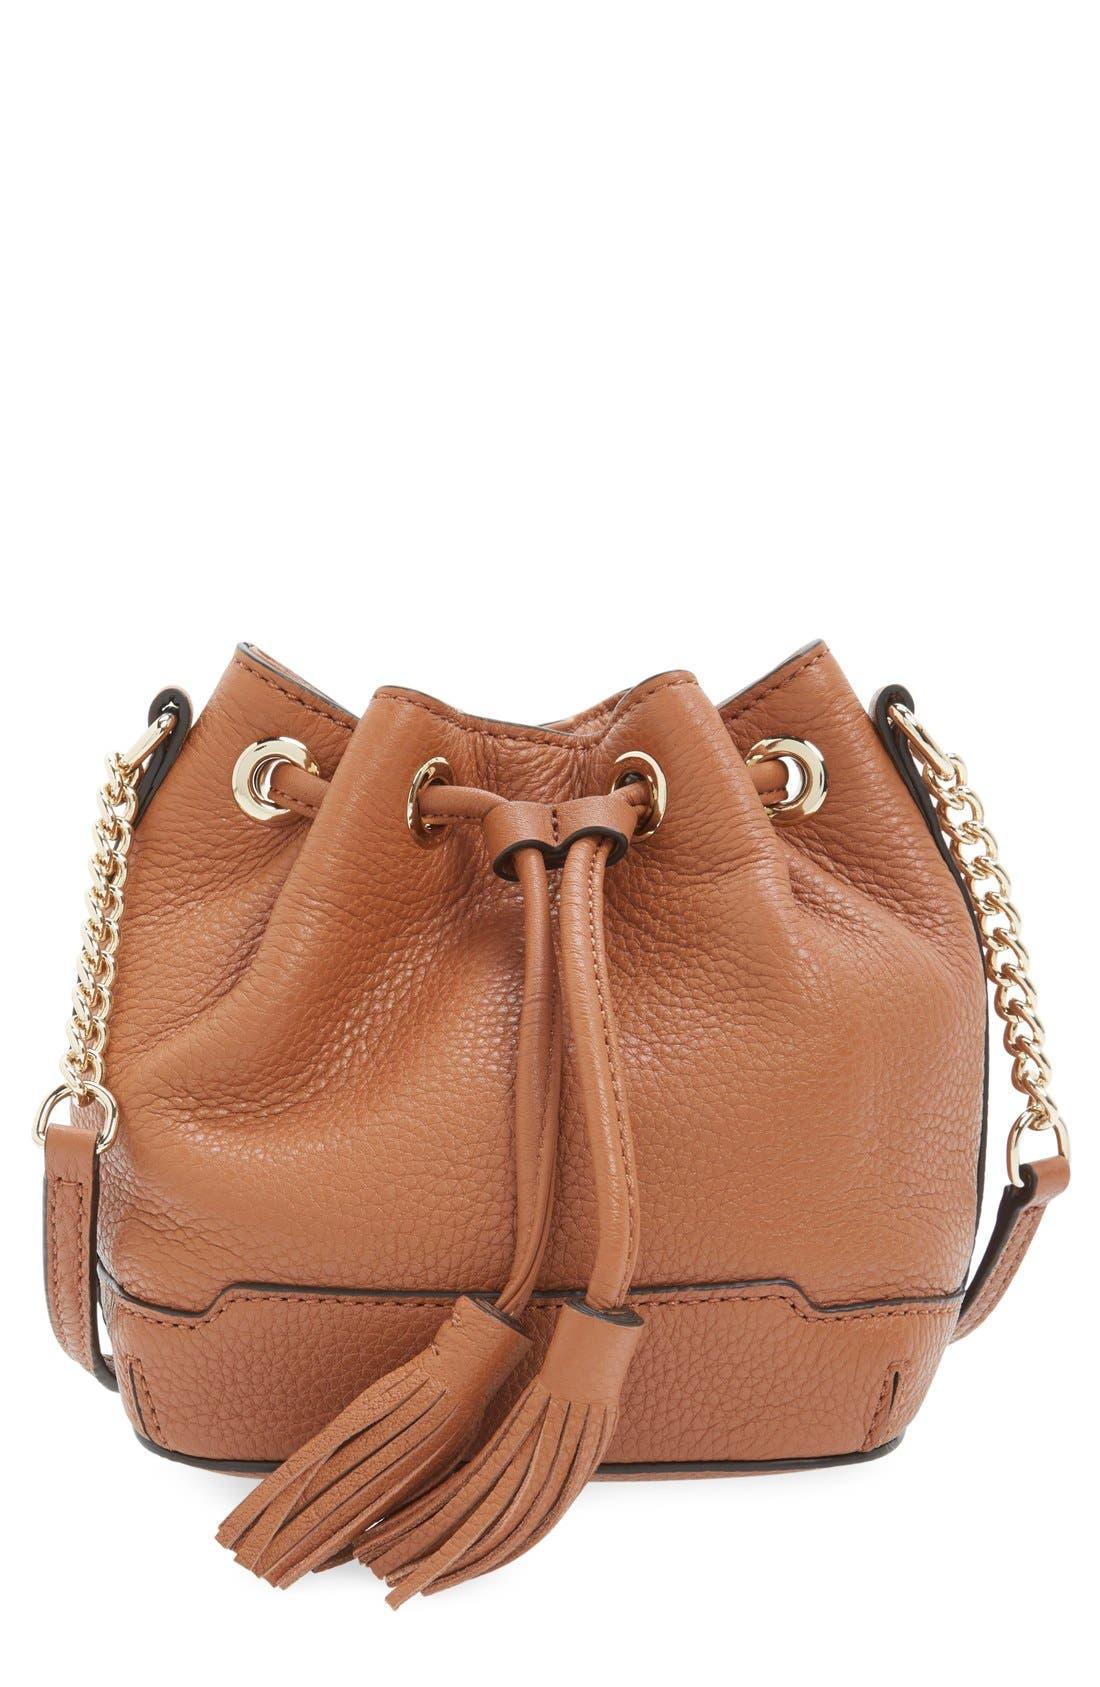 Main Image - Rebecca Minkoff 'Micro Lexi' Bucket Bag